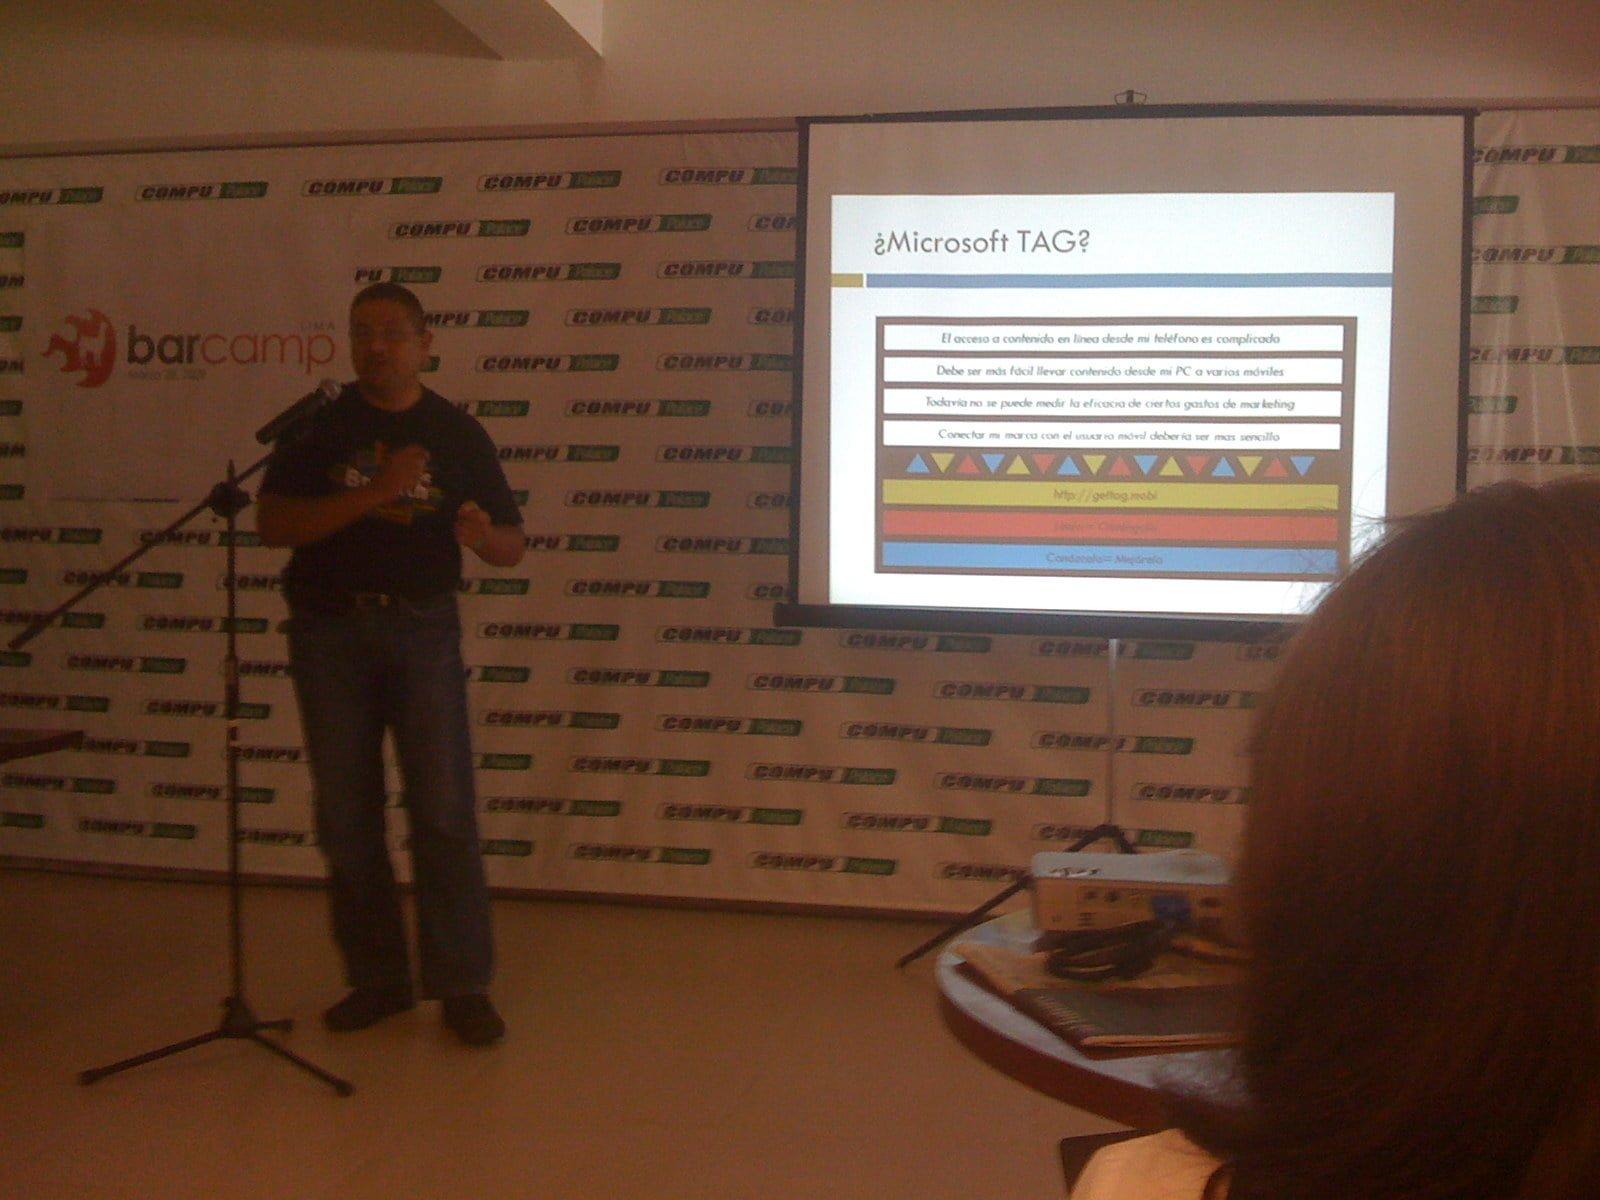 microsoft-tag-barcamp